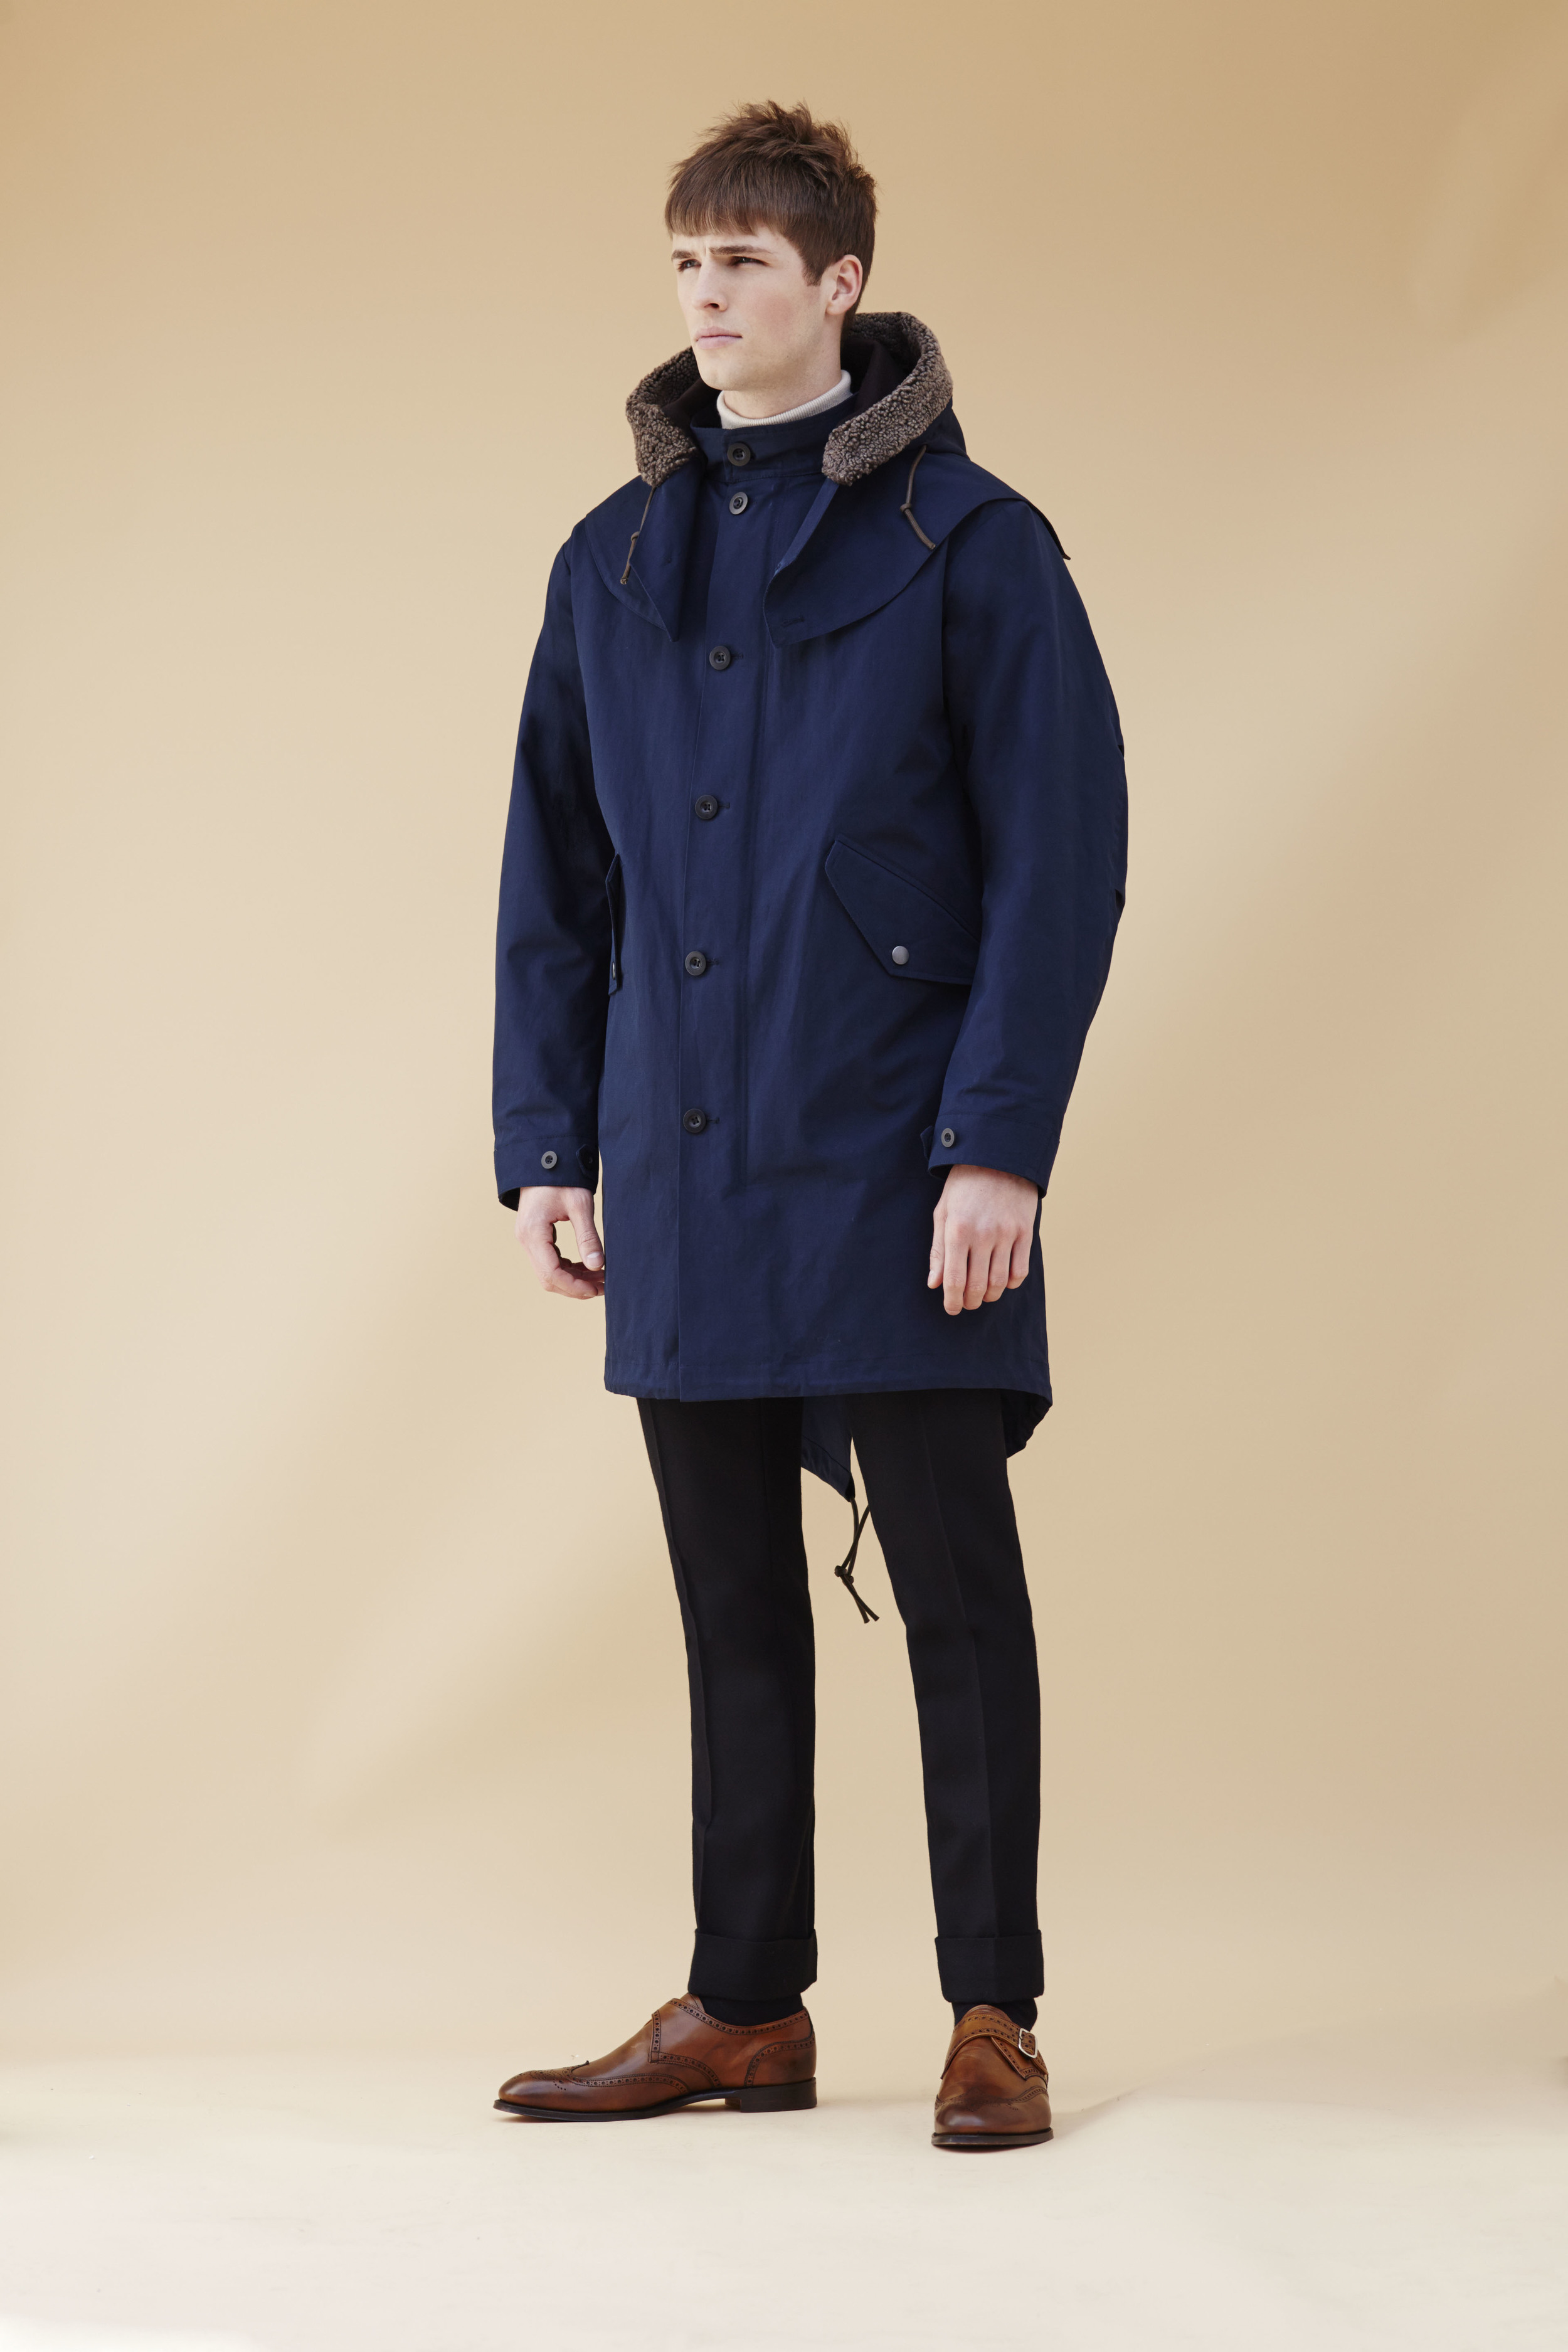 Mens parka coat Marks & Spencer | Sam Squire UK Male Fashion & Lifestyle blogger